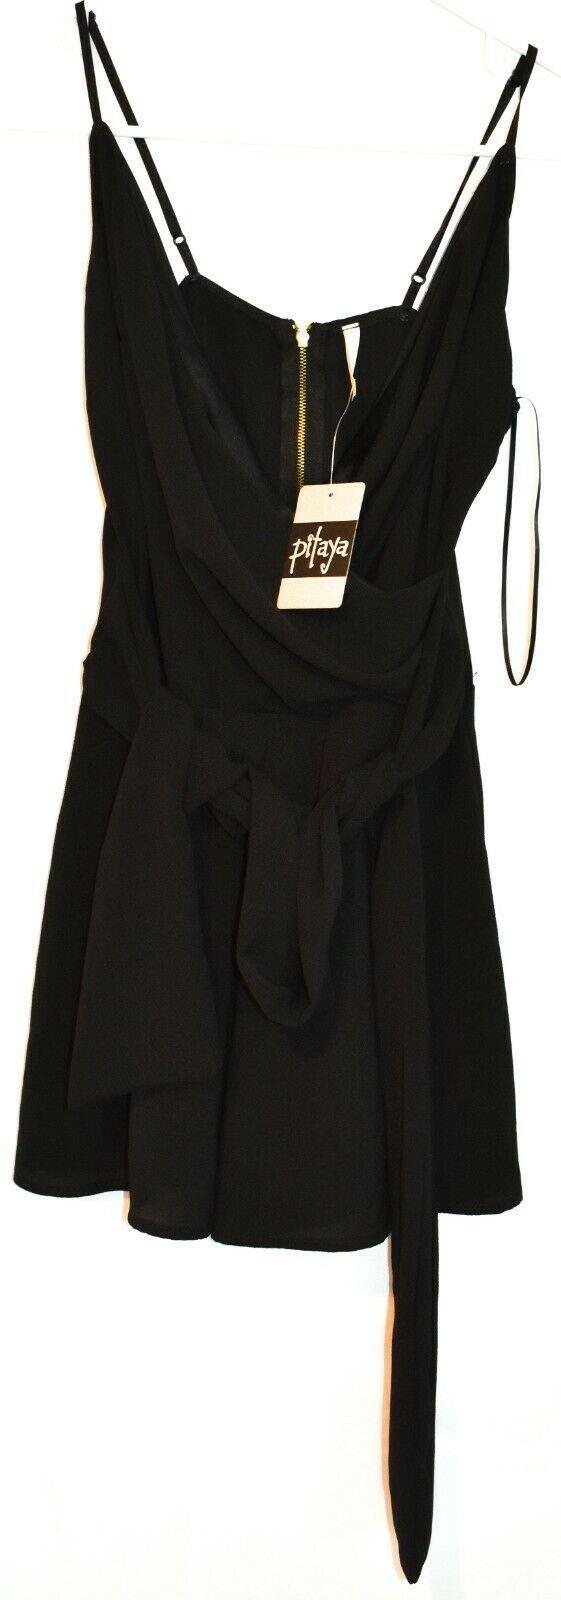 Pitaya Women's Tie Back Wrap Front Adjustable Strap Black Tank Romper Size M NWT